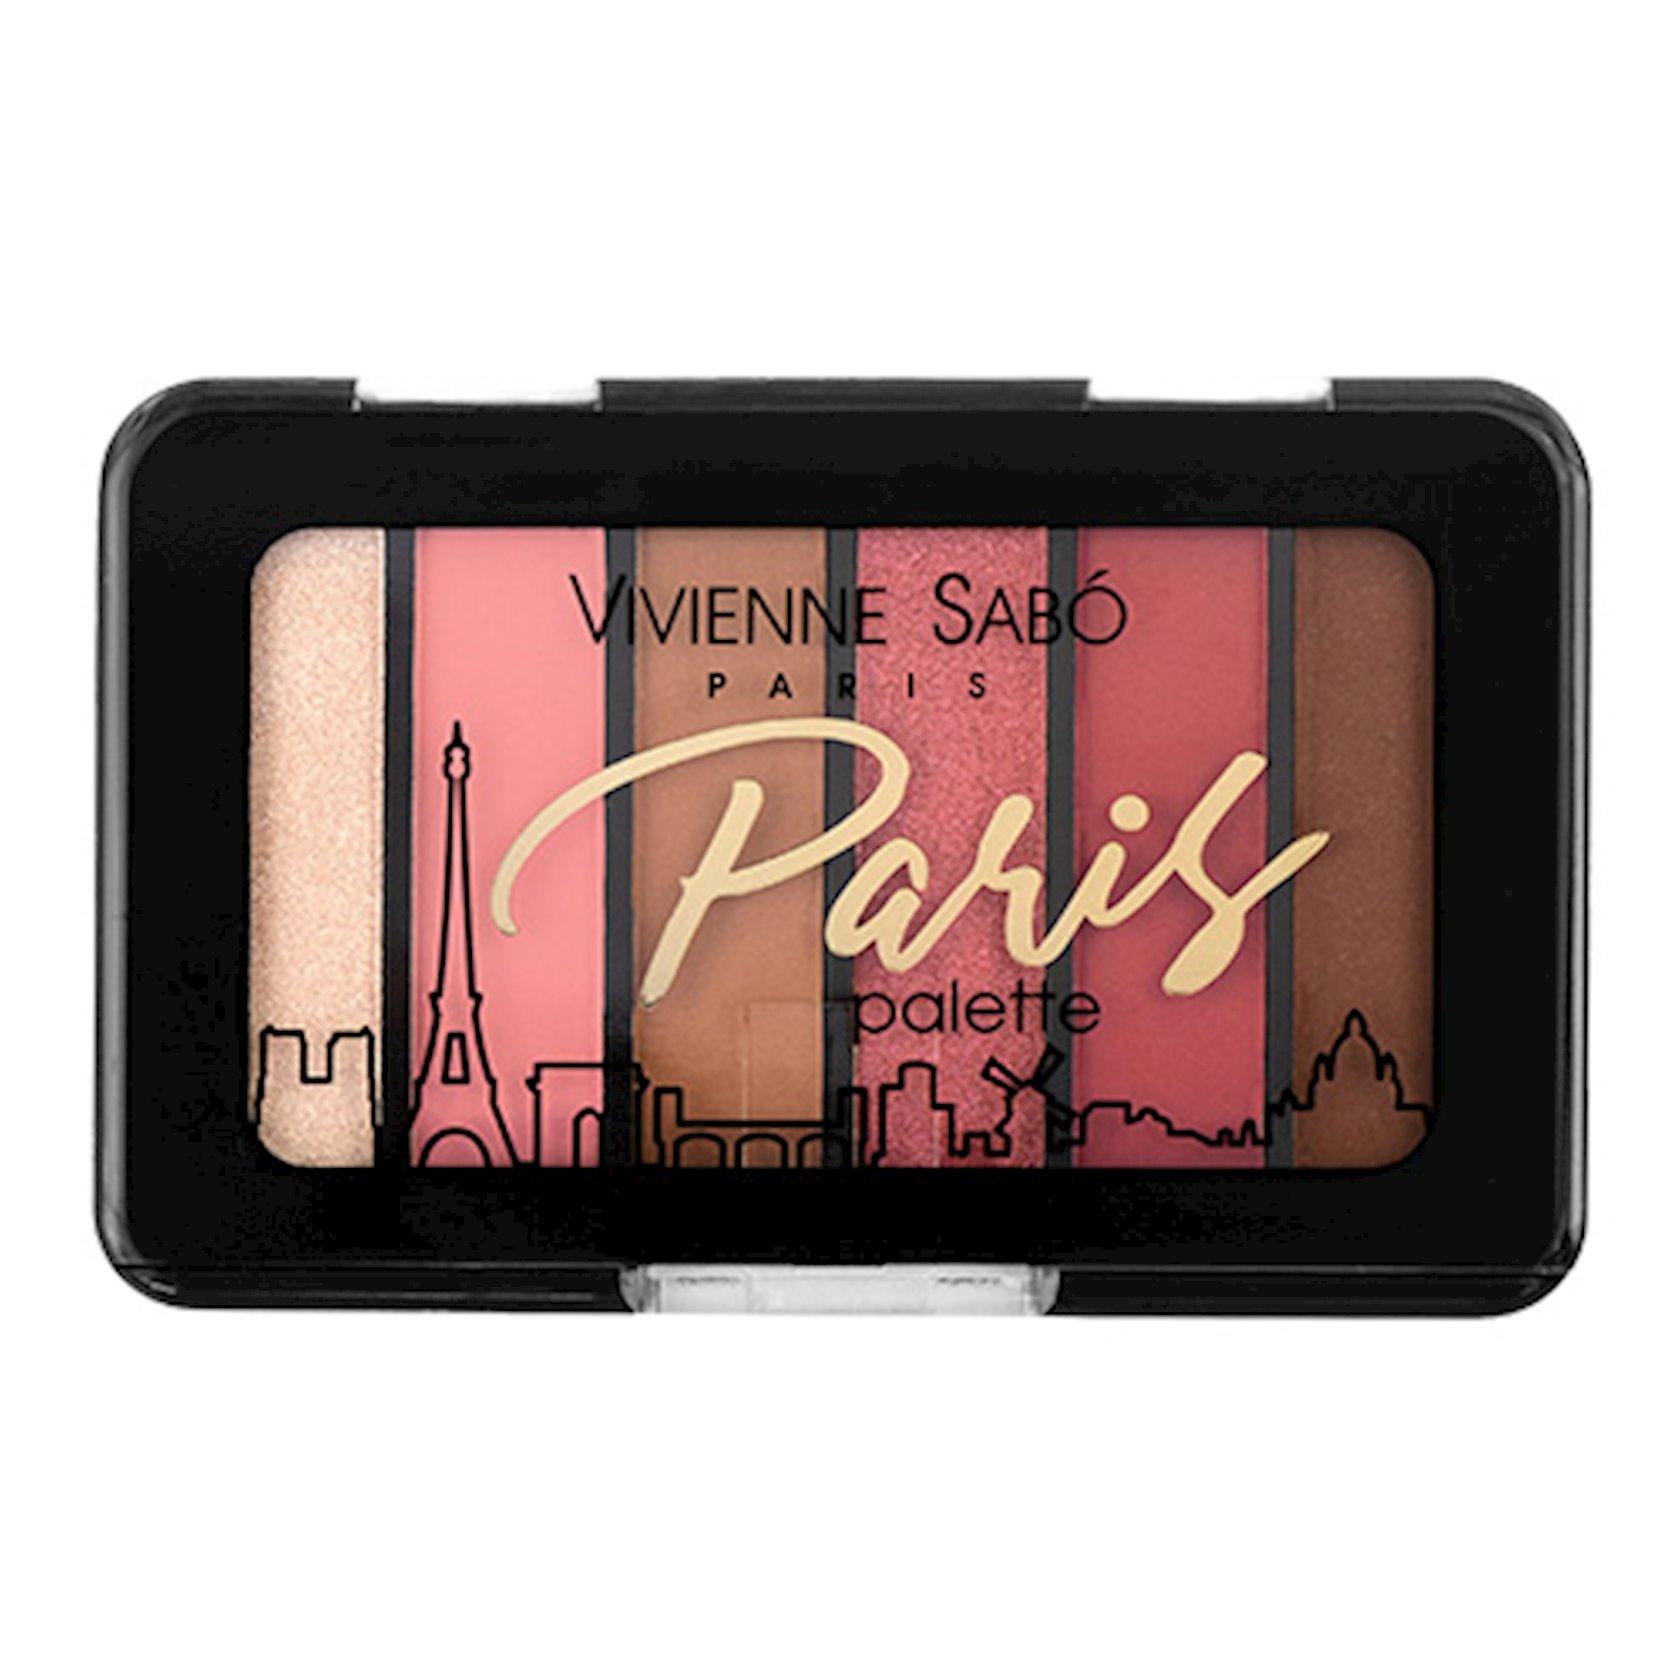 Göz kölgələri paleti Vivienne Sabo Eyeshadow Mini Palette Paris №04